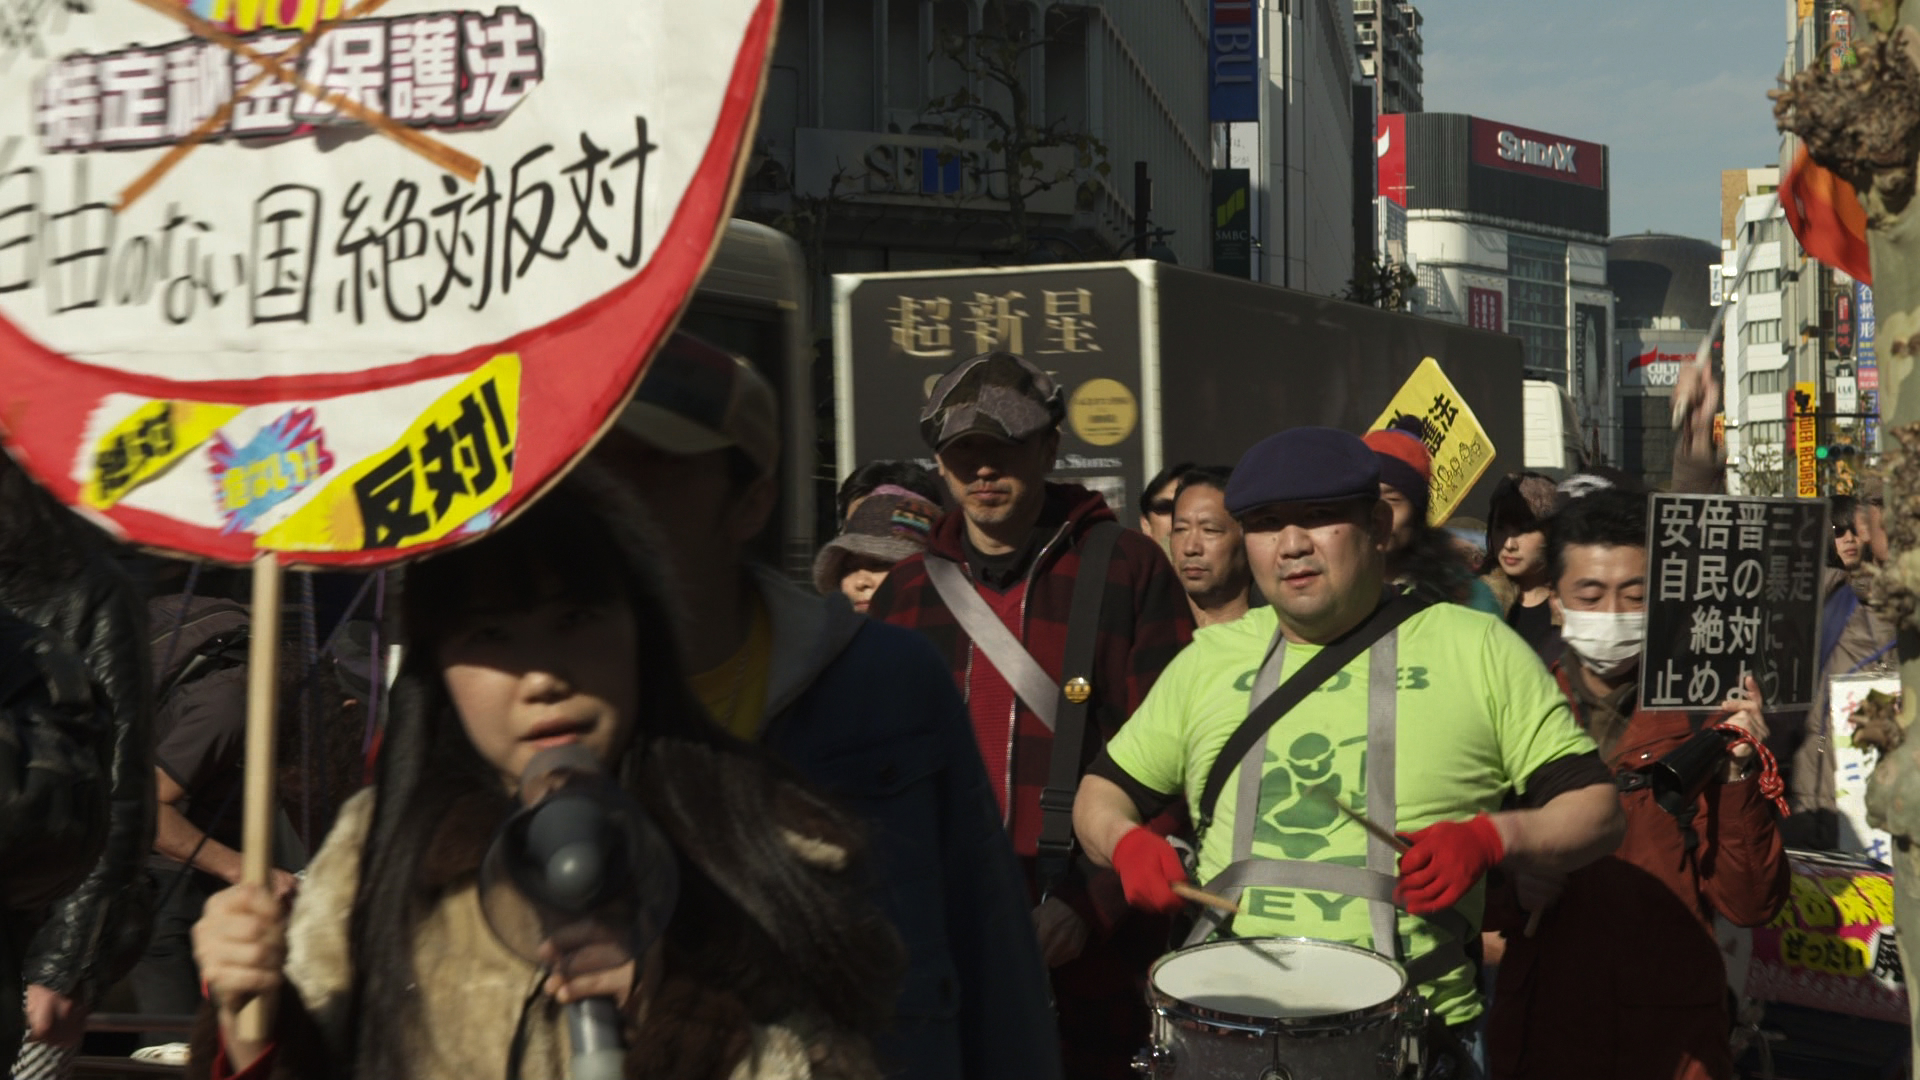 Protestors marching through Shibuya.